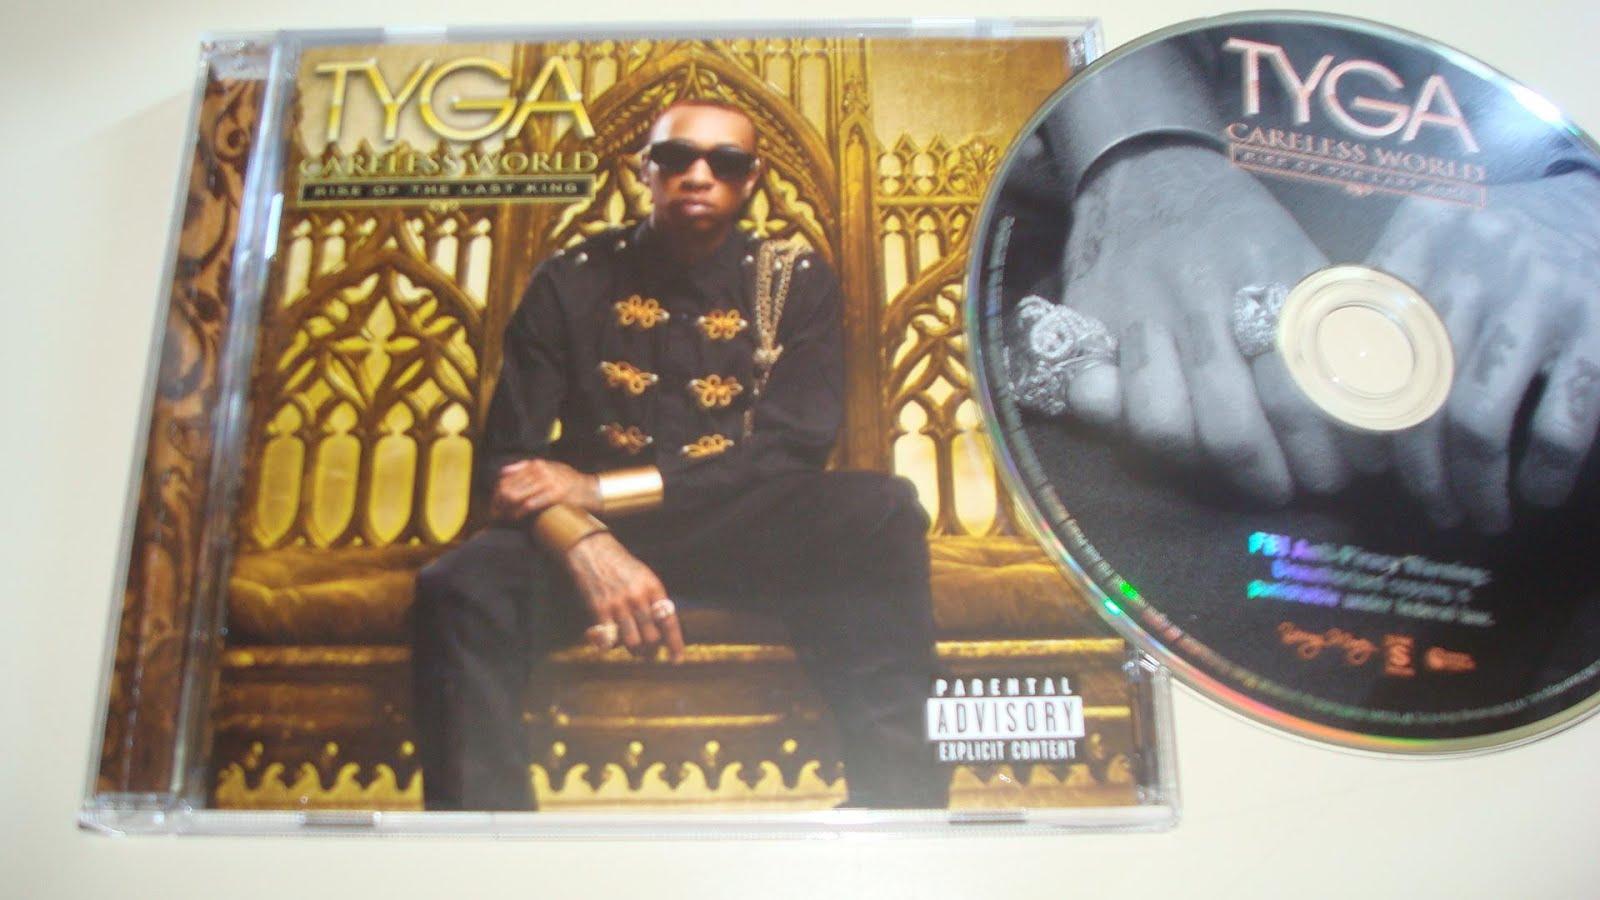 Tyga-Careless_World-(Deluxe_Edition)-2012-CR